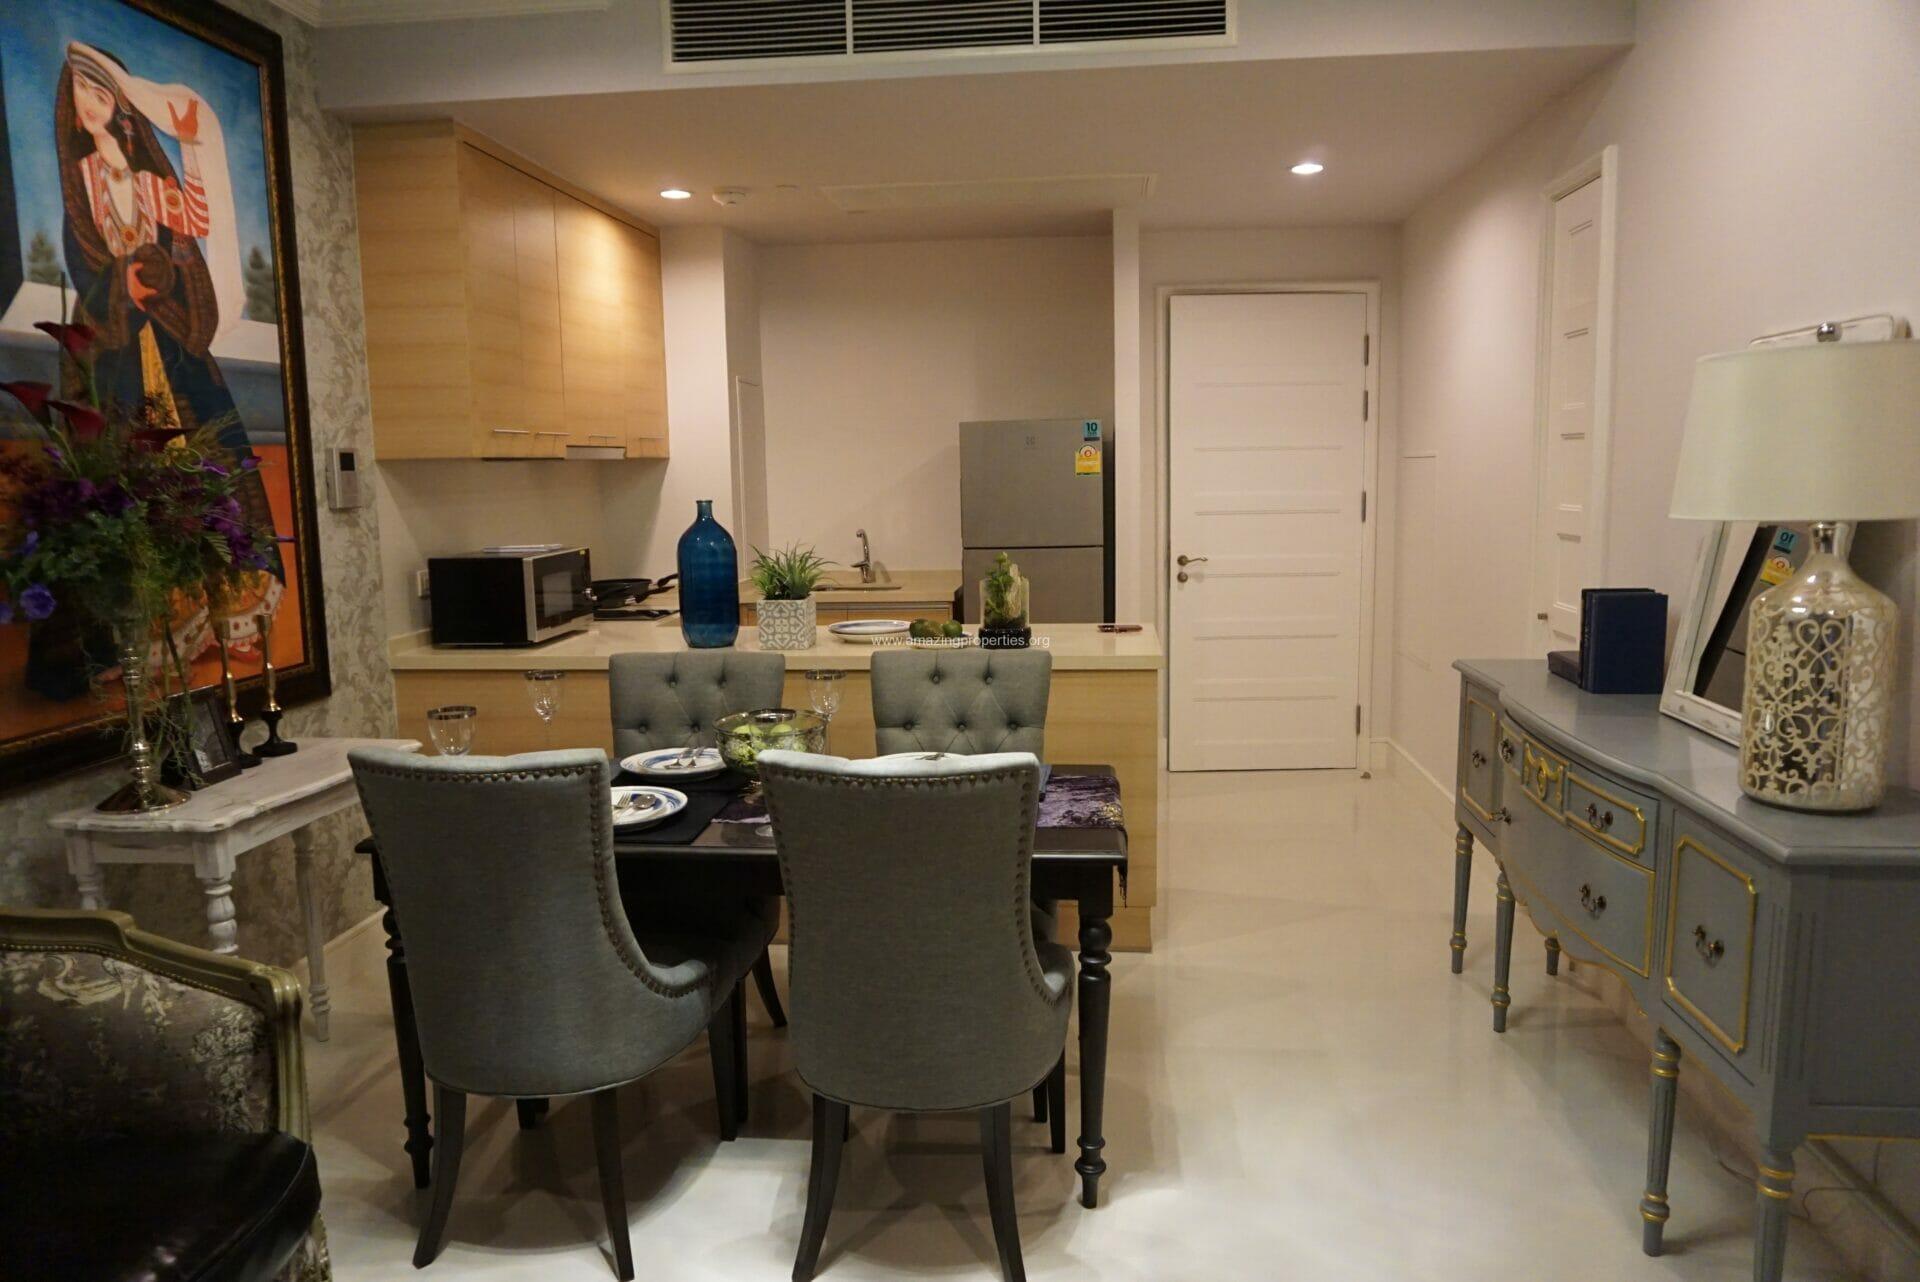 1 Bedroom Aguston Sukhumvit 22 for Rent (9)